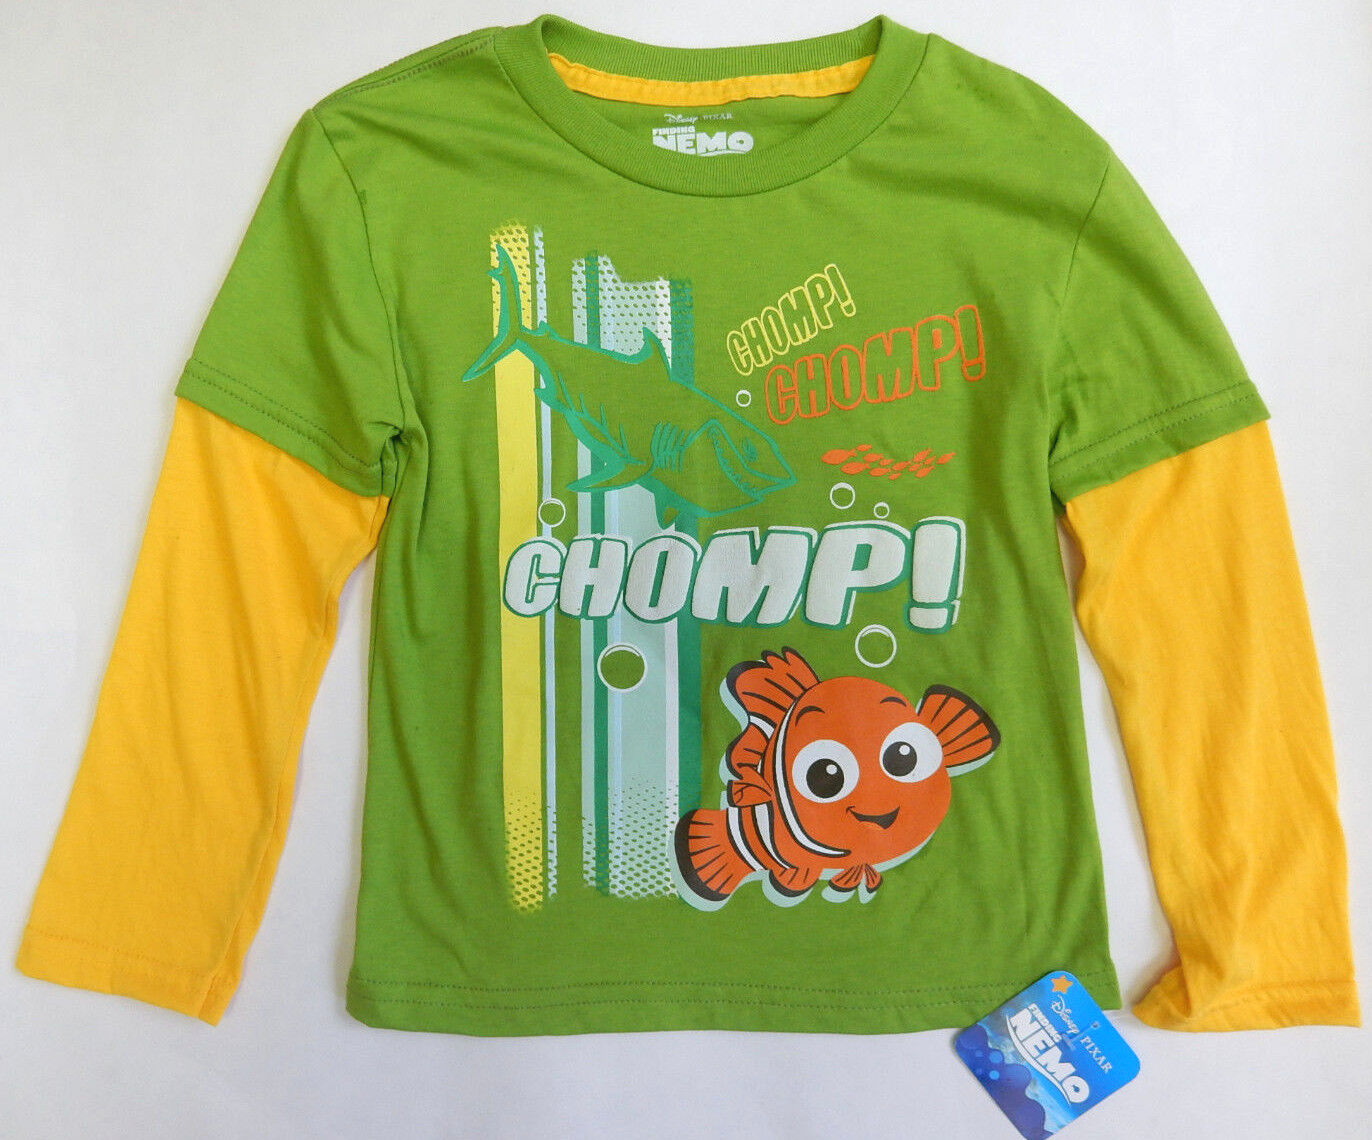 Disney 4T Finding Nemo Layered Long Sleeve Shirt Toddler Boy Clothing  - $14.99